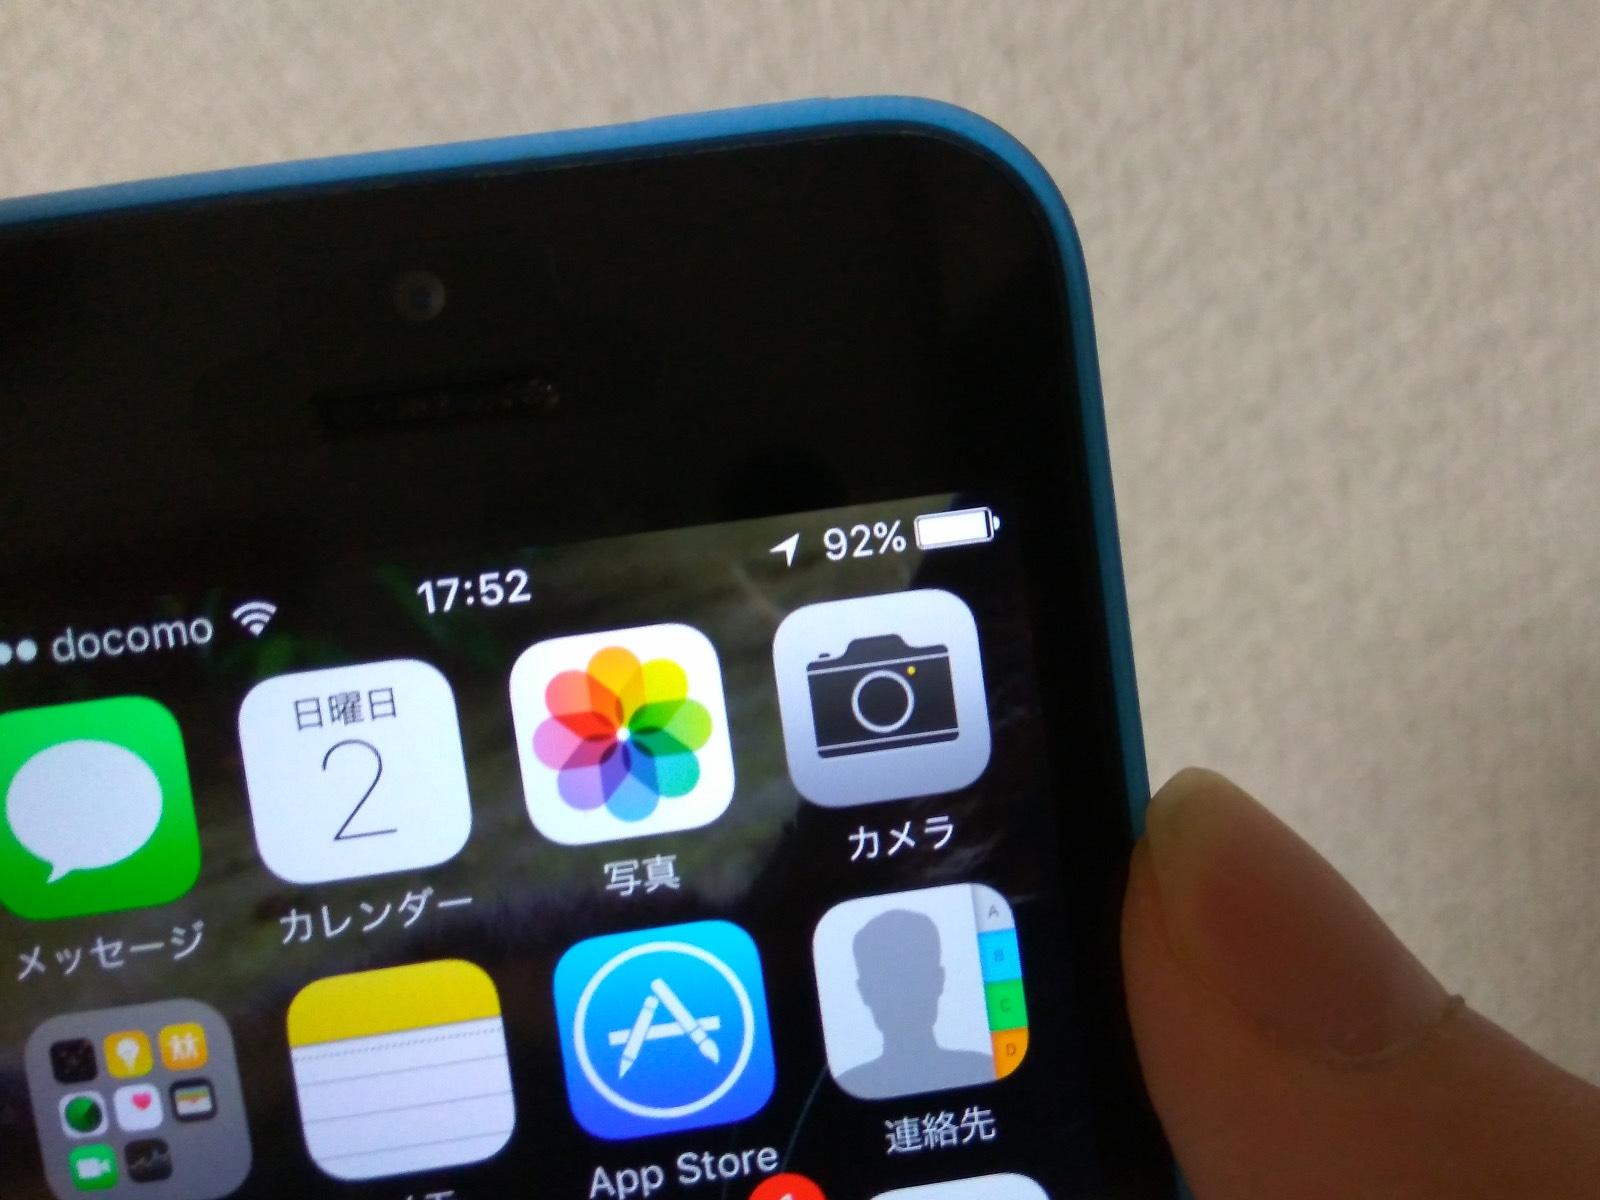 iPhone 5c バッテリー交換 正常動作